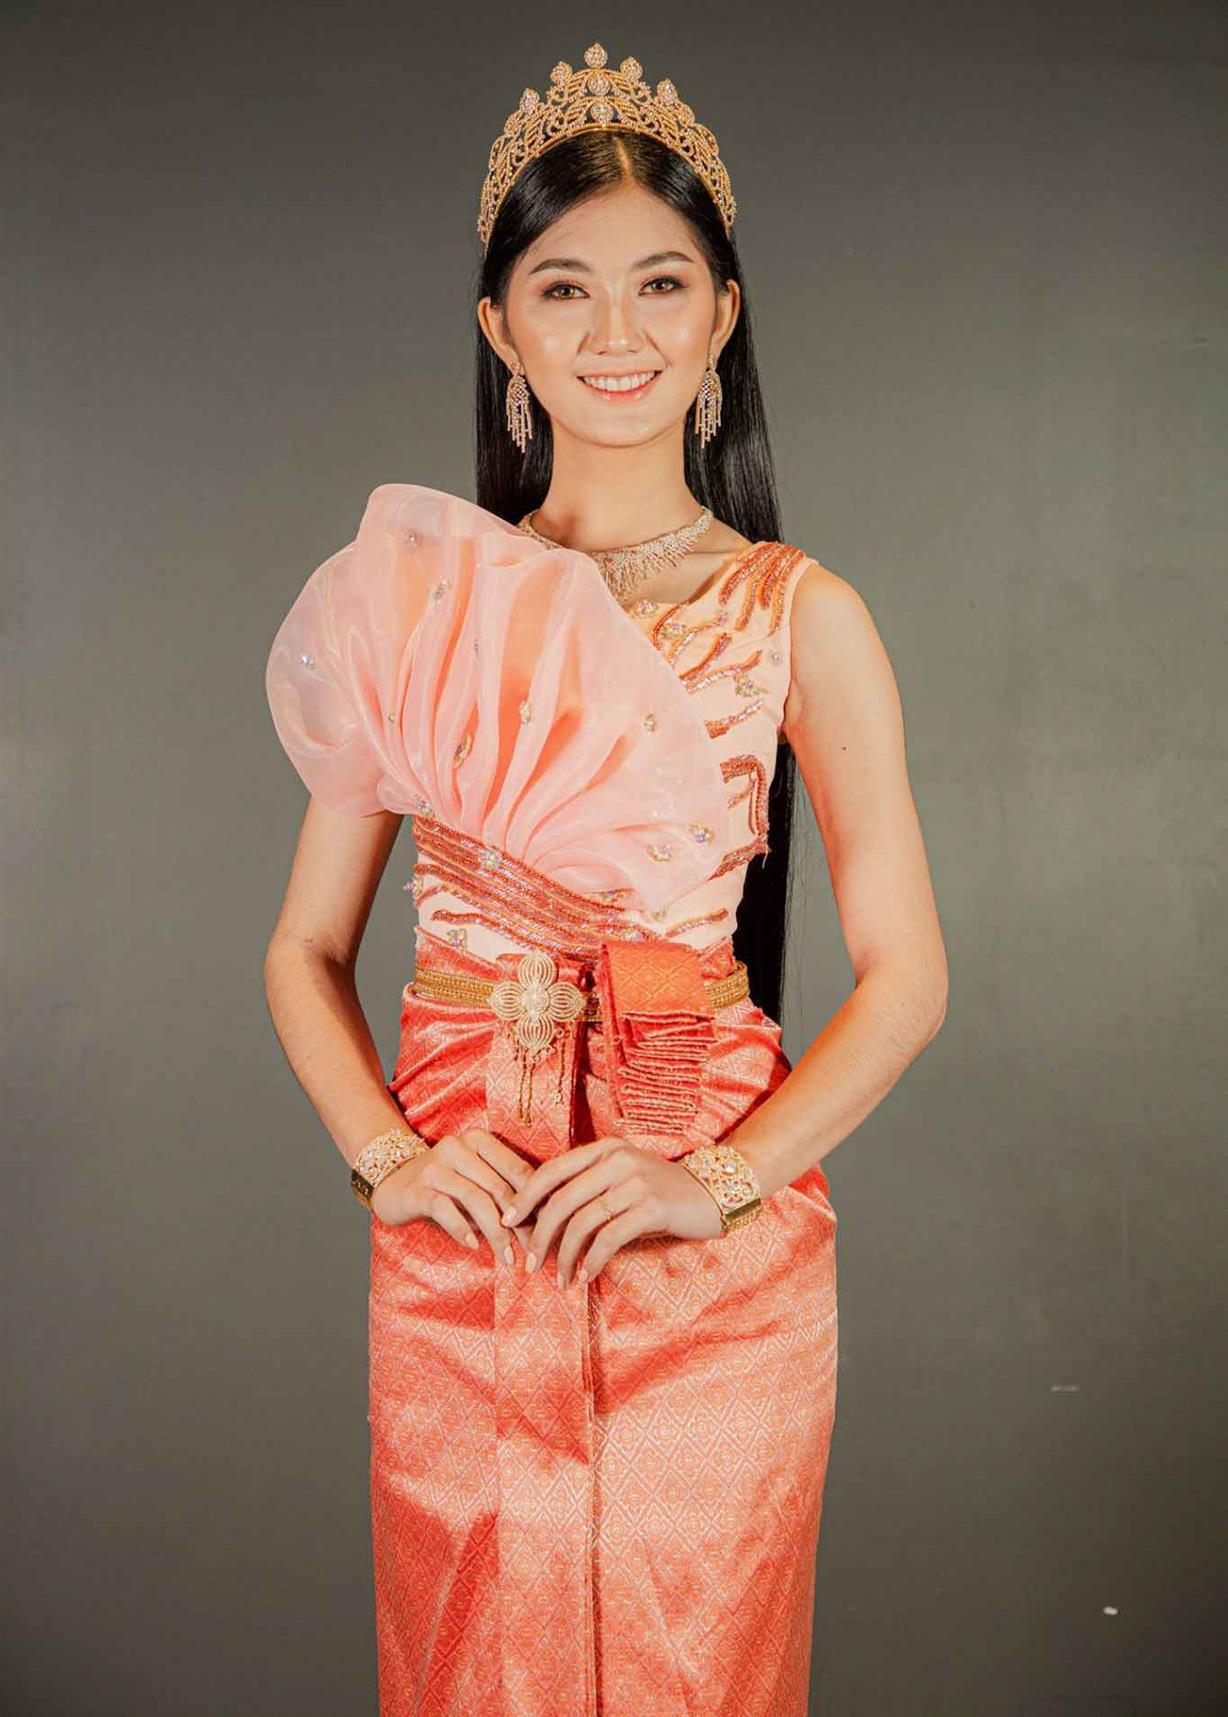 Miss Grand Kep 2020 Hor Chhenghim